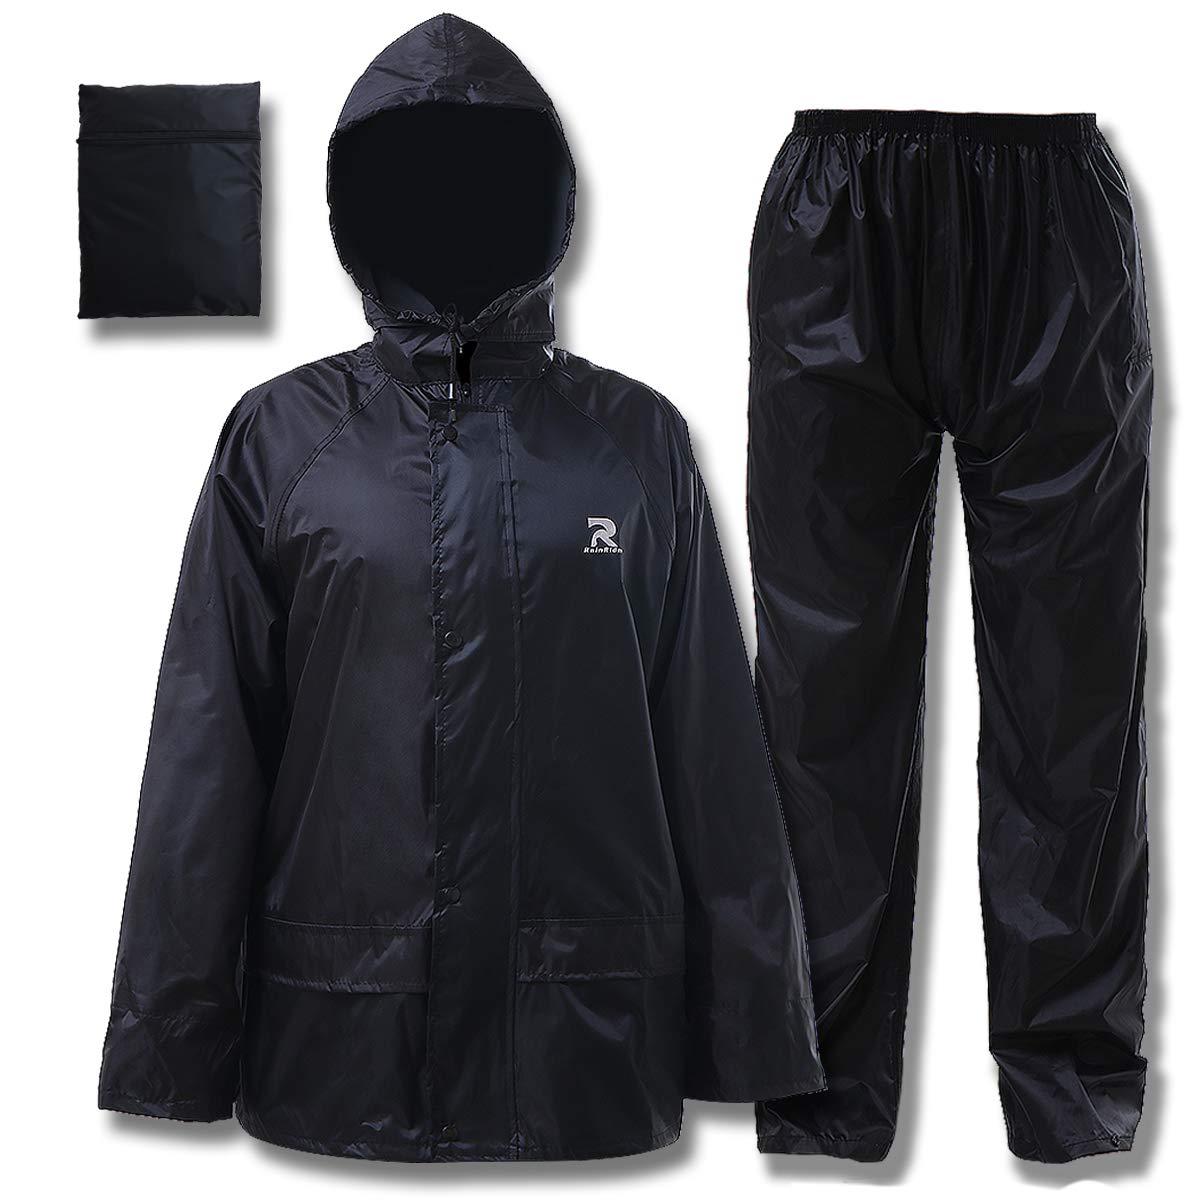 Rain Suit for Men Women Ultra-Lite Rain Gear Jacket with Pants 3-Piece Portable Ripstop(Black,Medium)